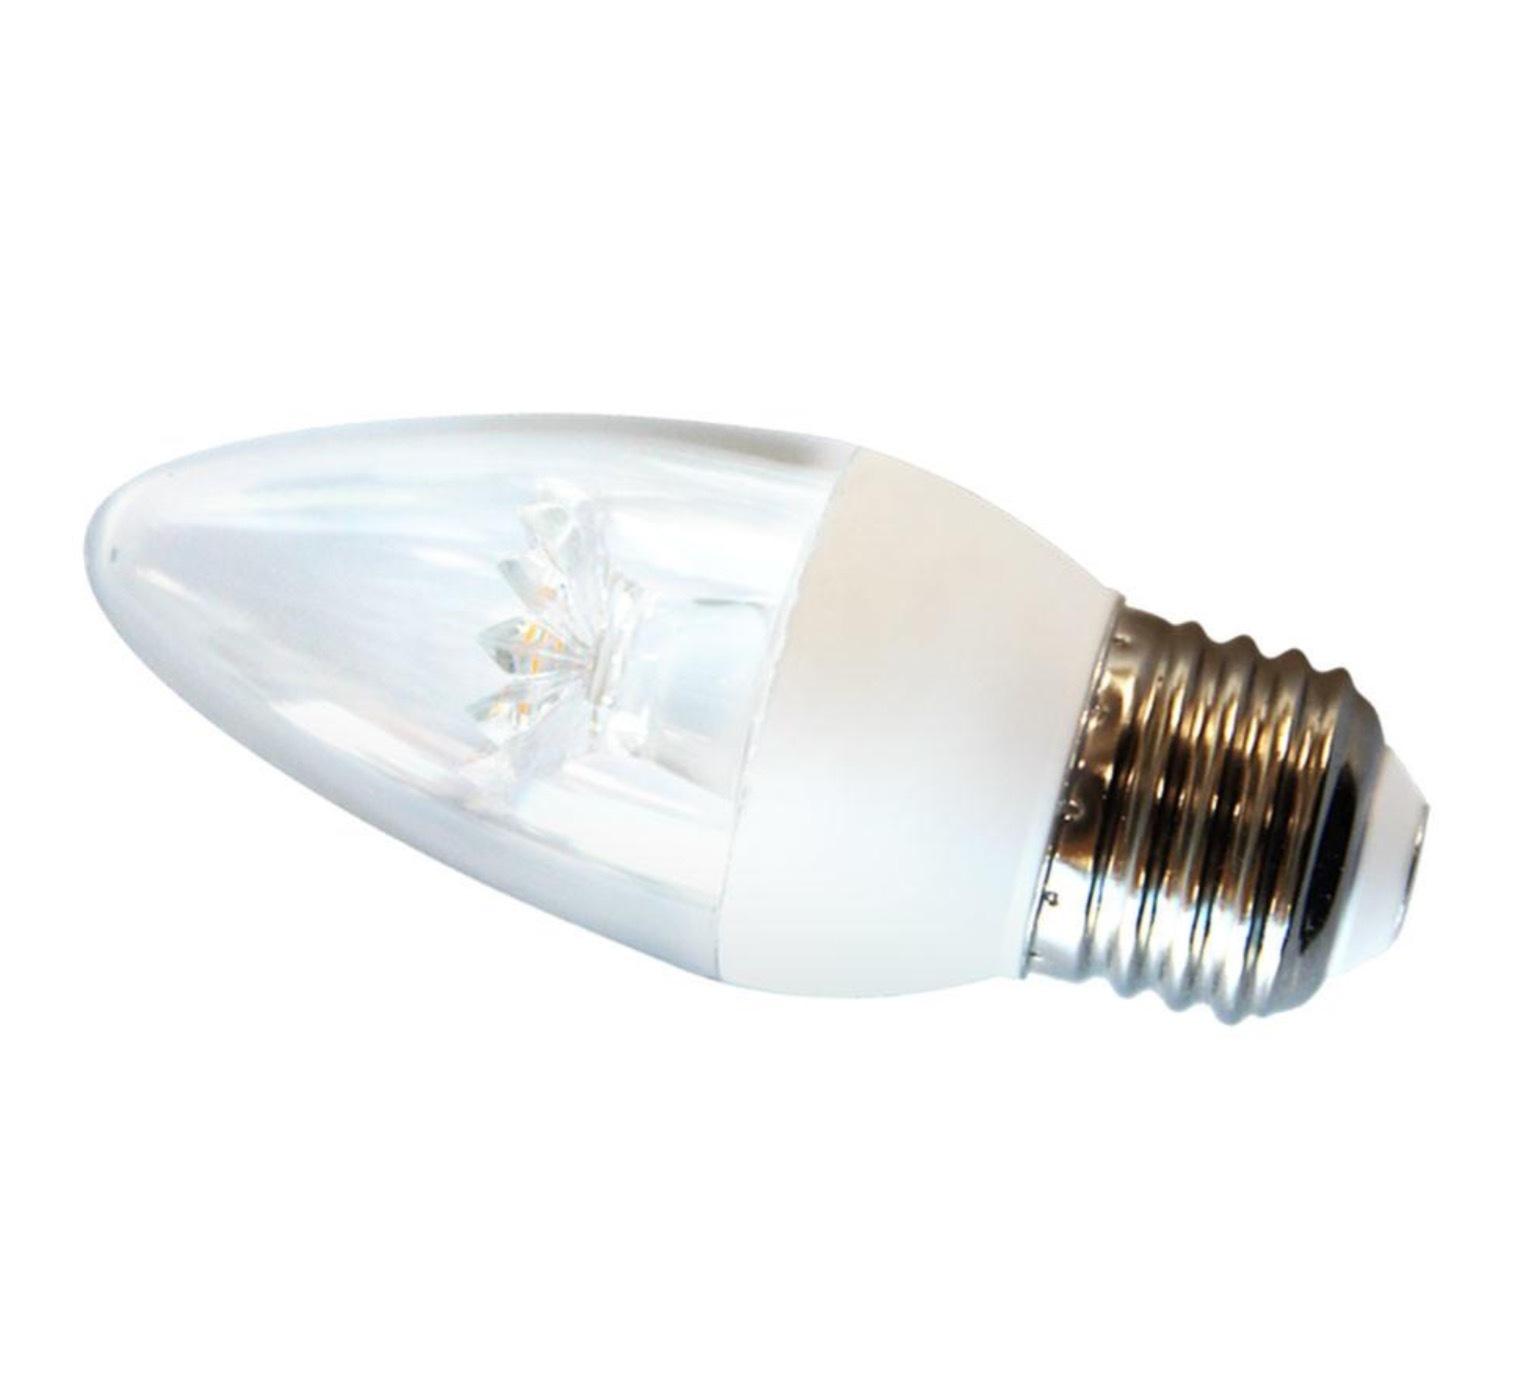 6 bulbs ecosmart 40w equivalent soft white b11 candelabra led light bulb light bulbs. Black Bedroom Furniture Sets. Home Design Ideas